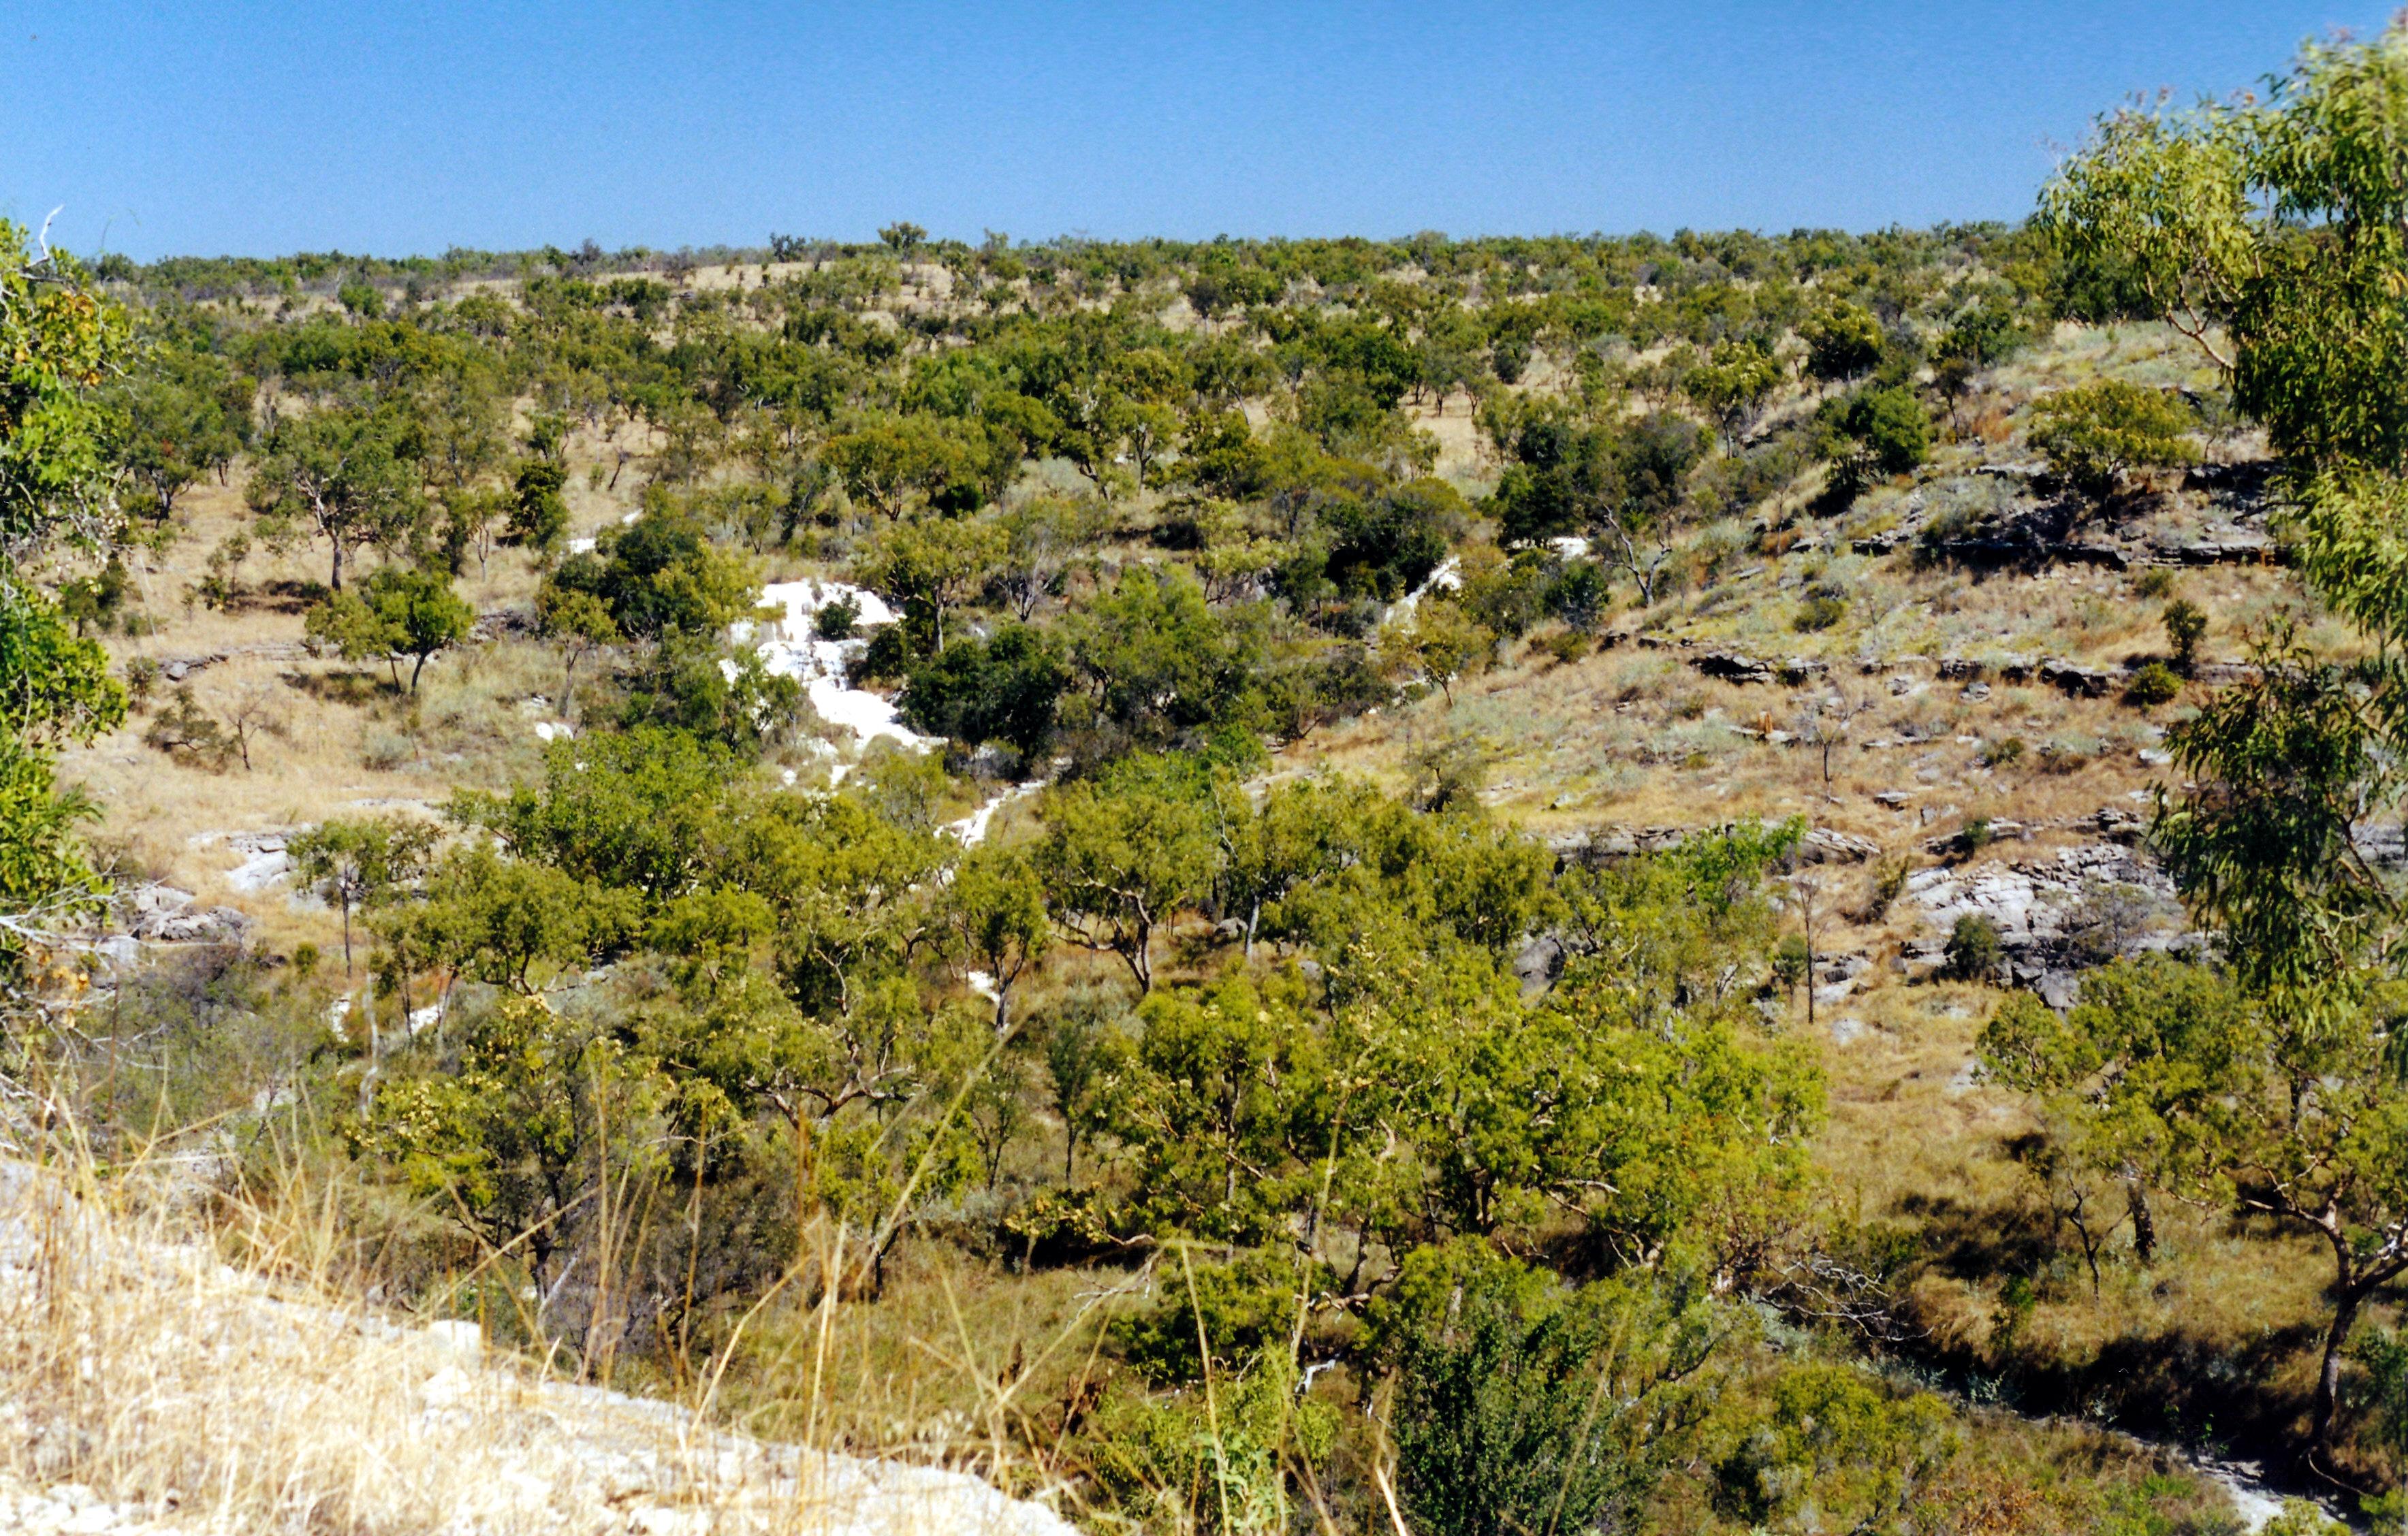 06-22-2000 02 calcite near Limestone Gorge.jpg